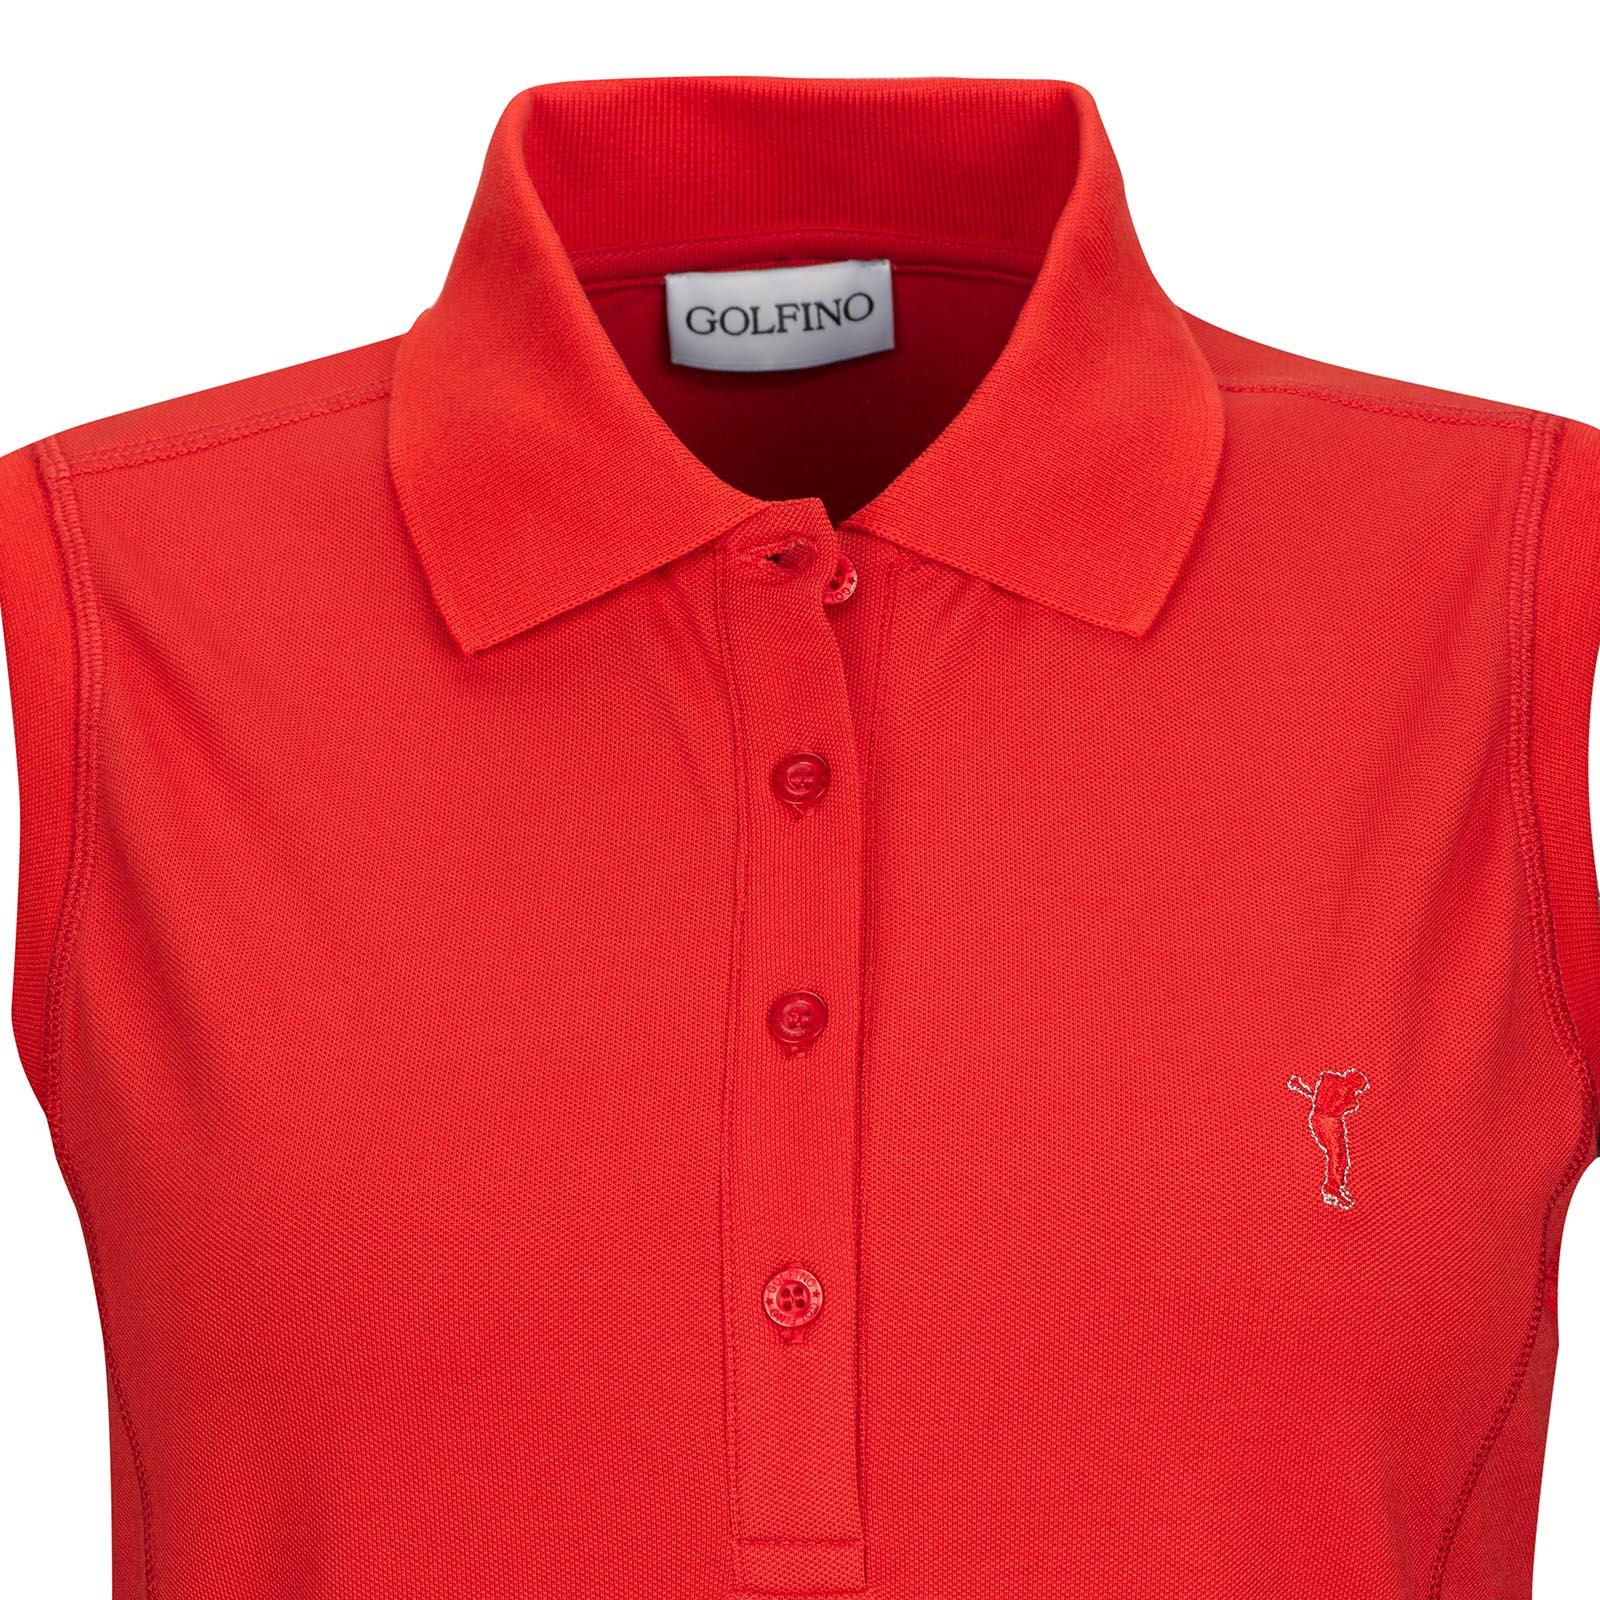 Ärmelloses Damen Golf Polohemd Sun Protection in Slim Fit